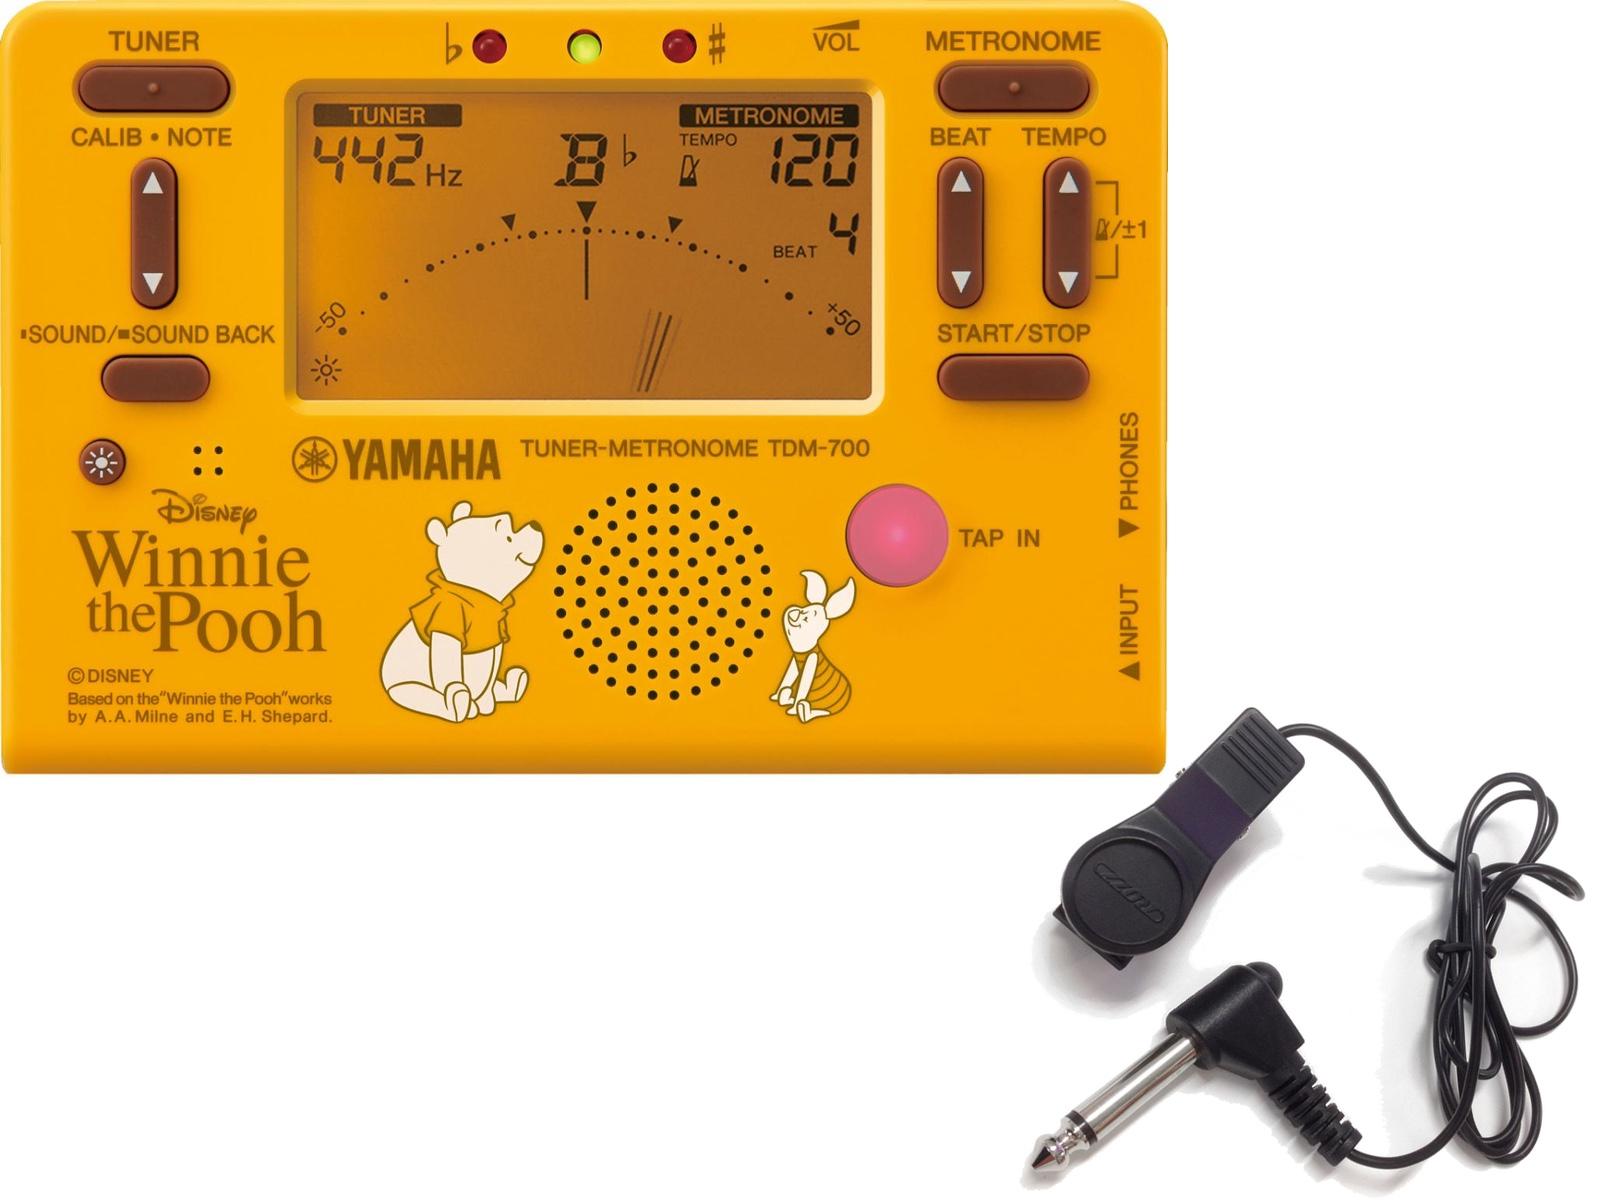 Disney Tuner Metronome TDM-700 Winnie the Pooh 信憑 メール便出荷品 YAMAHA ヤマハ TDM700DPO4 沖縄不可 くまのプーさん ブライトイエロー マイク チューナーメトロノーム 直営店 ディズニー 北海道不可 クロマチックチューナー セット 離島不可